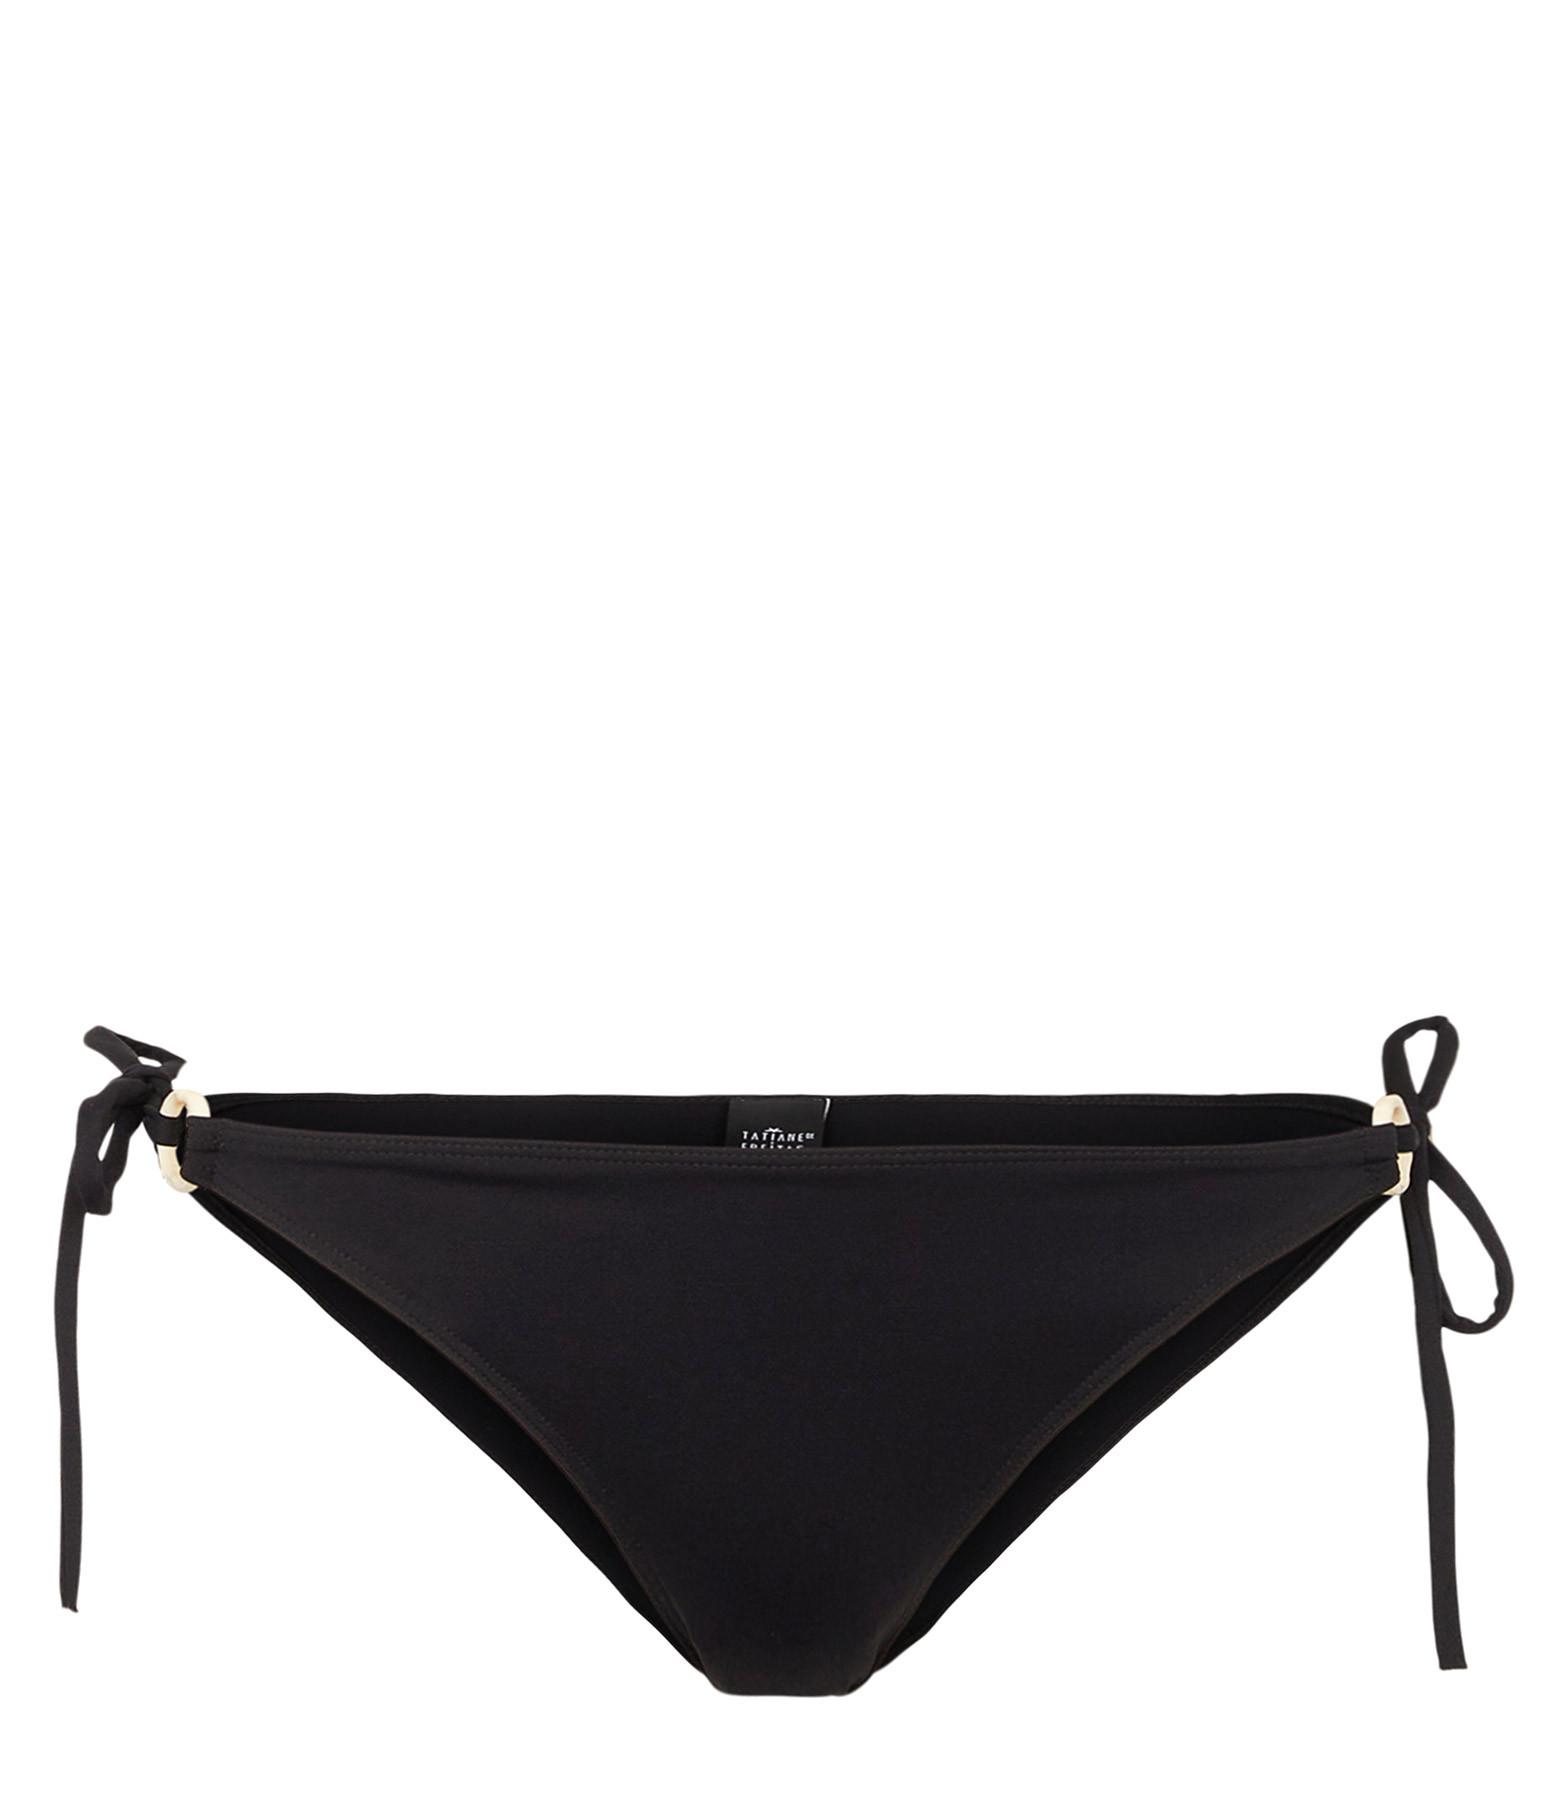 TATIANE DE FREITAS - Culotte de Bain Escale Noir